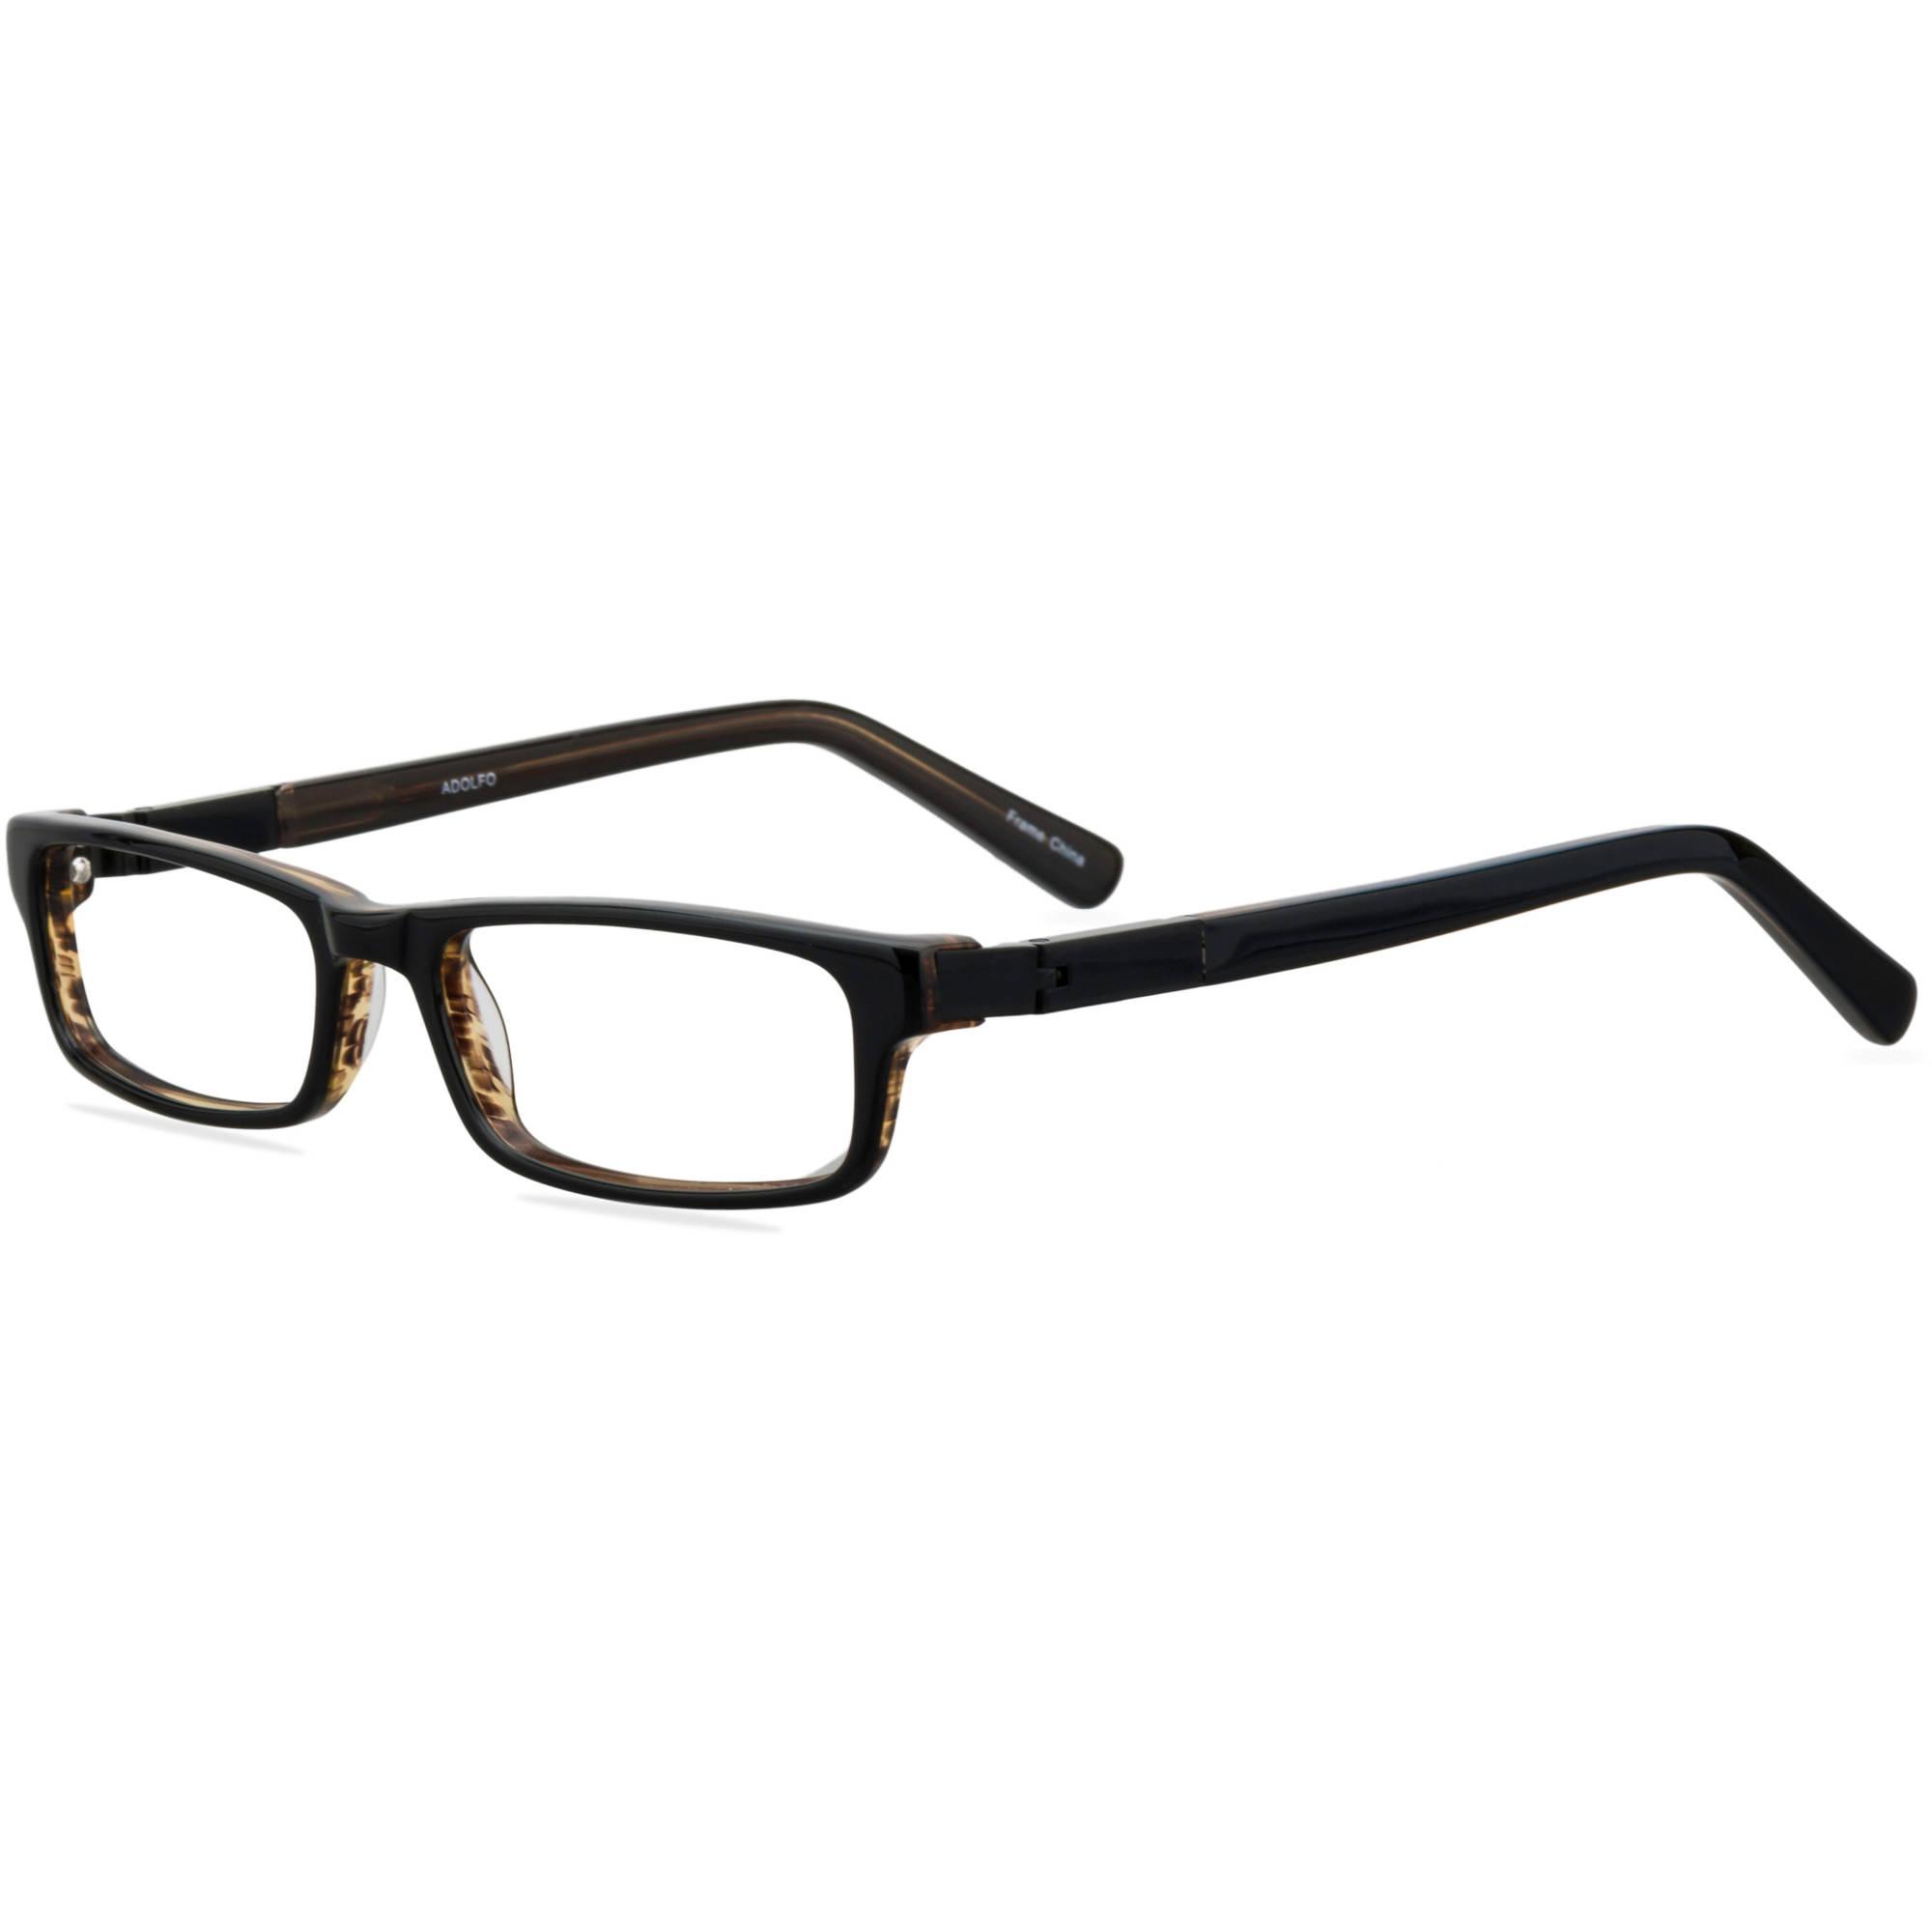 Image of ADOLFO Boys Prescription Glasses, Goalkeeper Black Amber